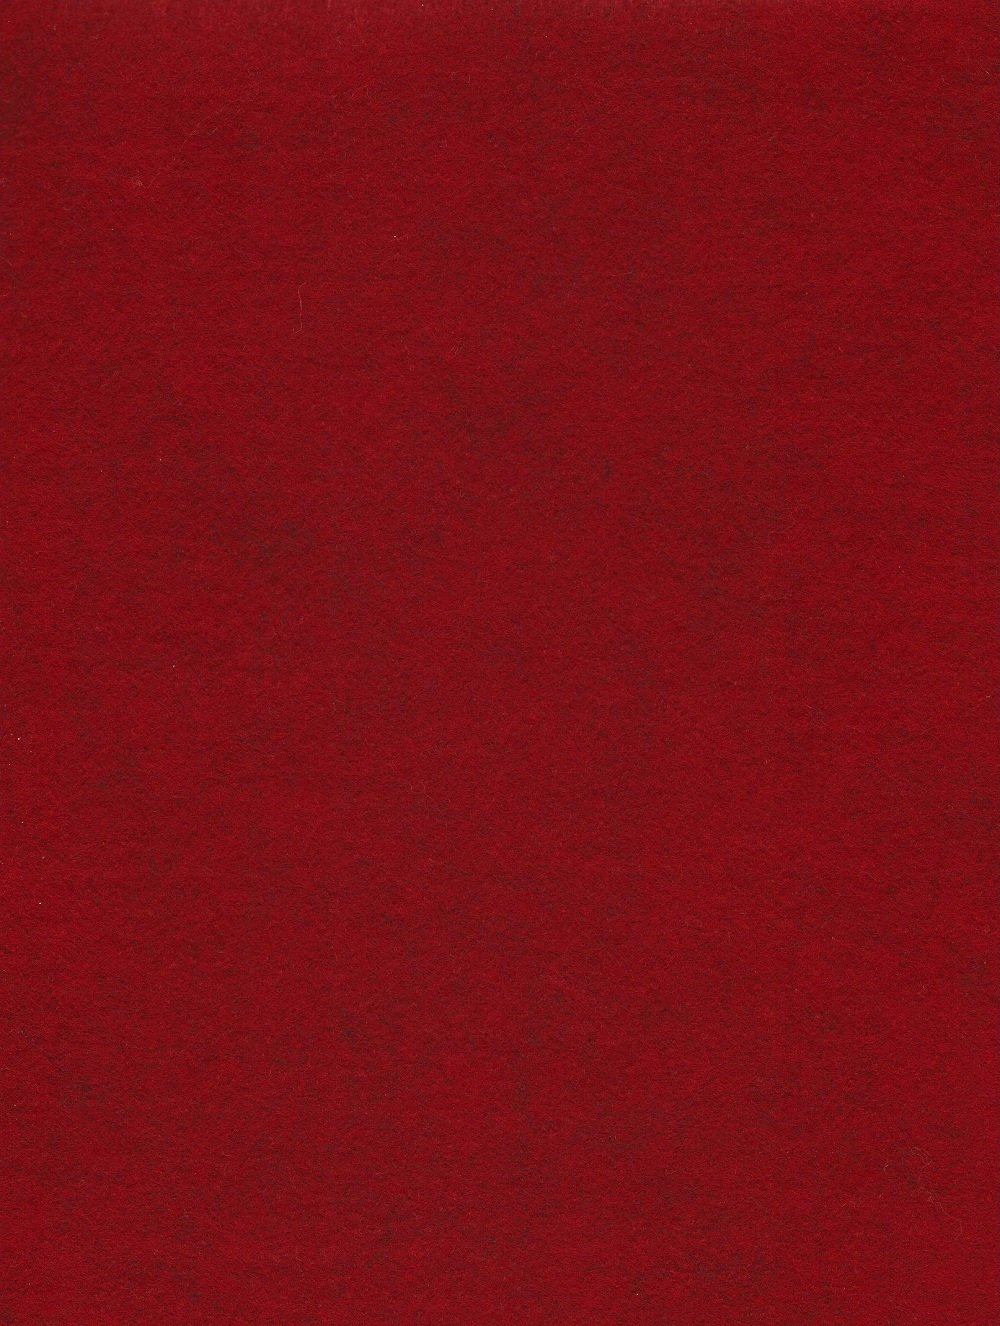 Barnyard Red - 12 x 18 Square